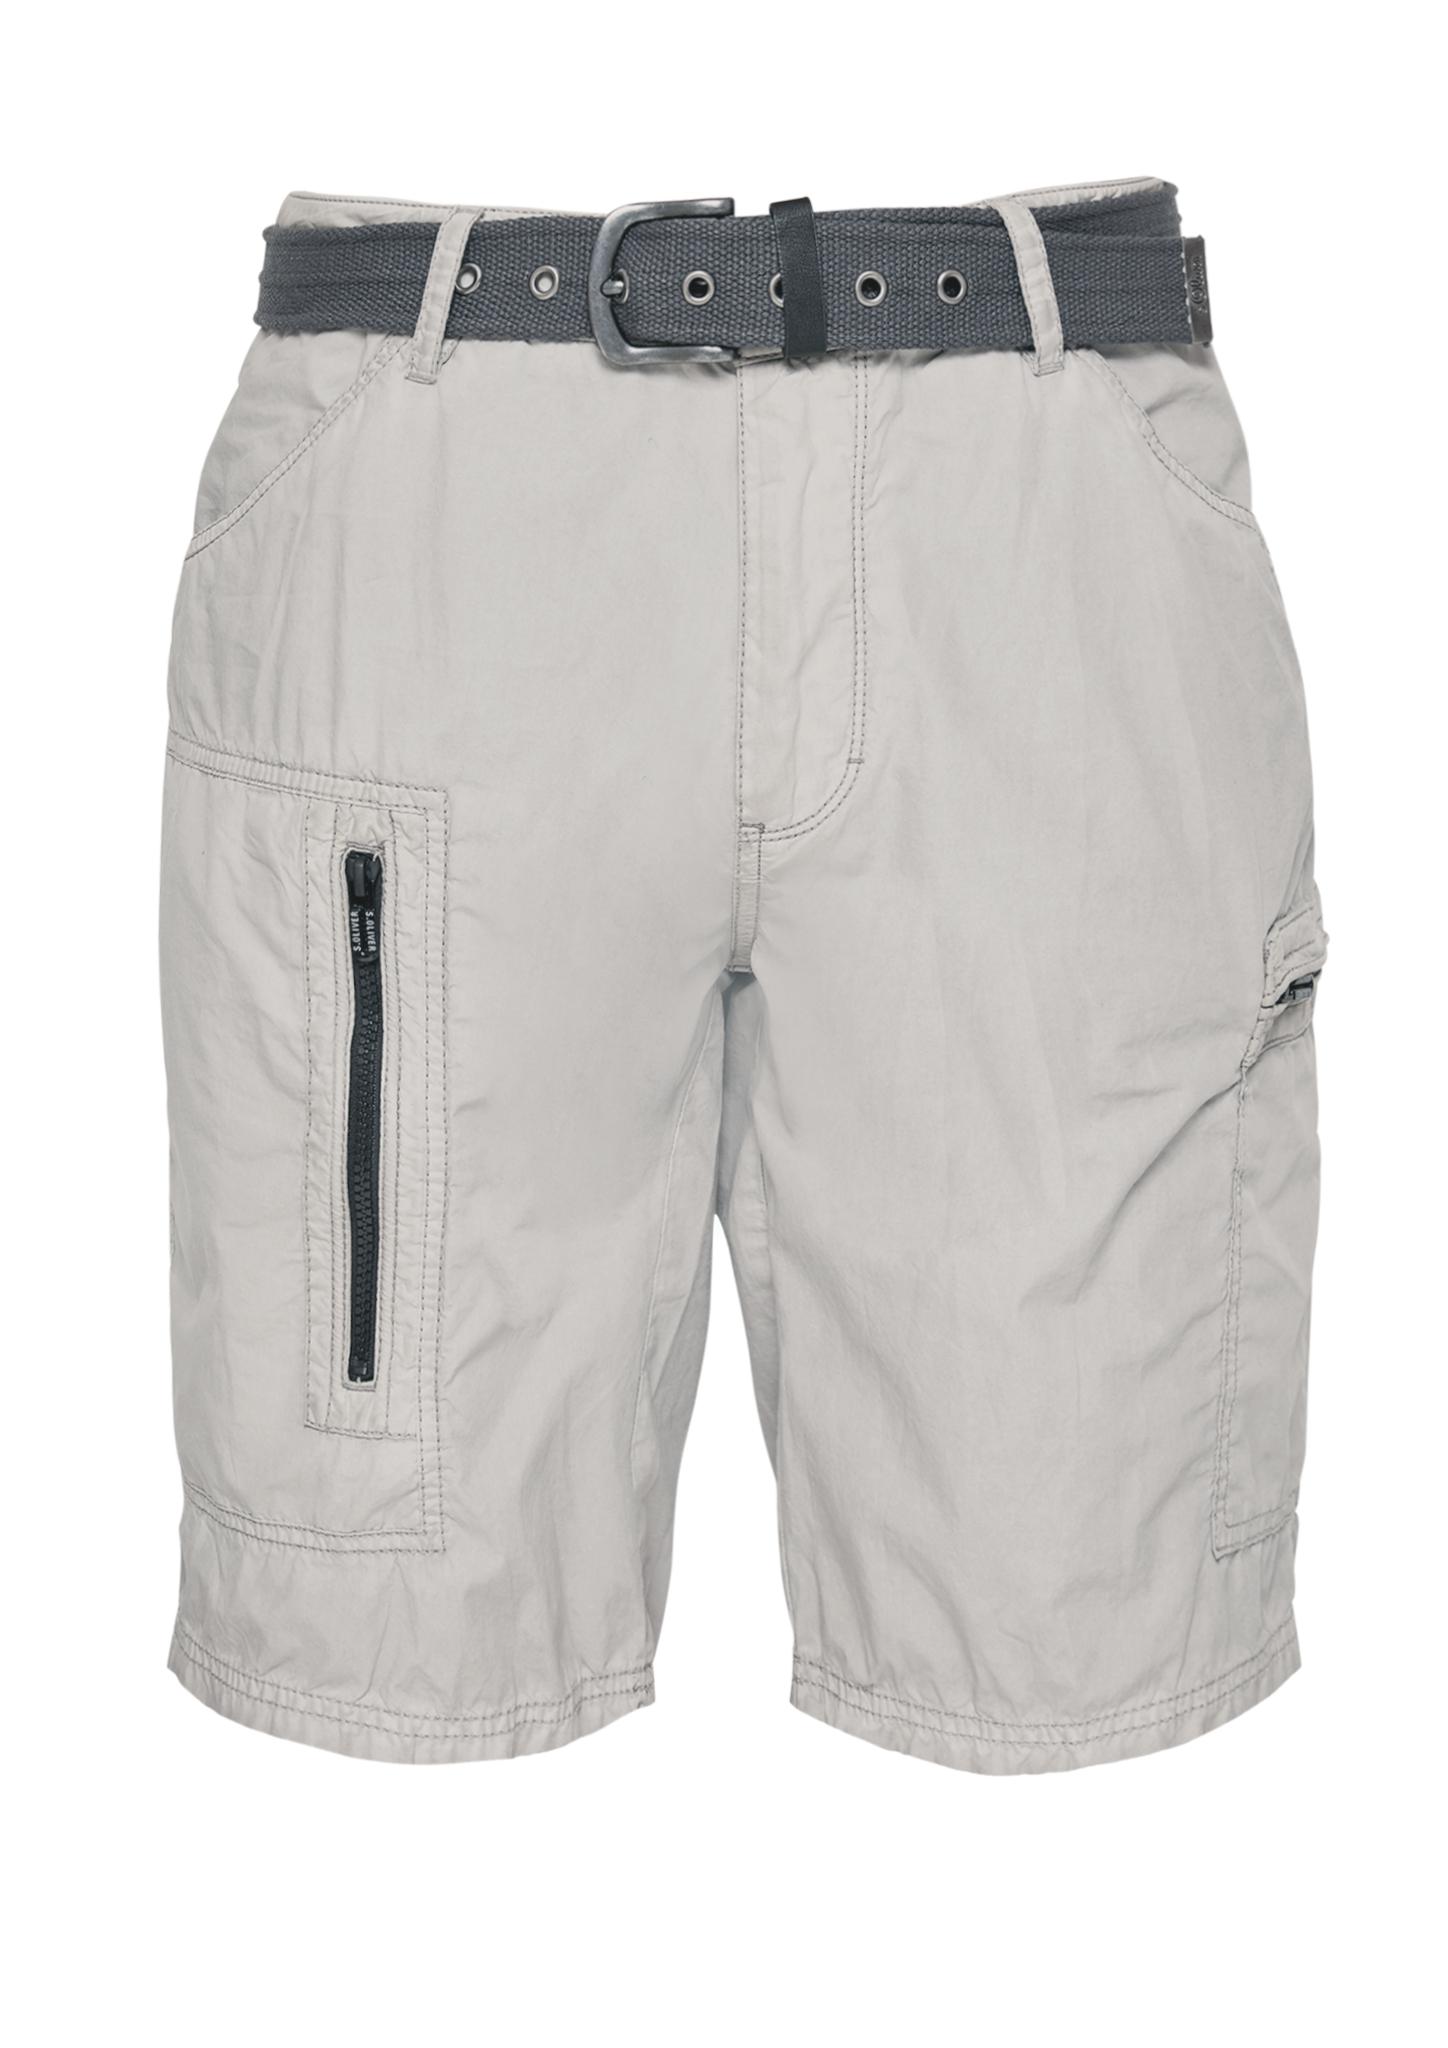 Shorts | Bekleidung > Shorts & Bermudas > Shorts | s.Oliver